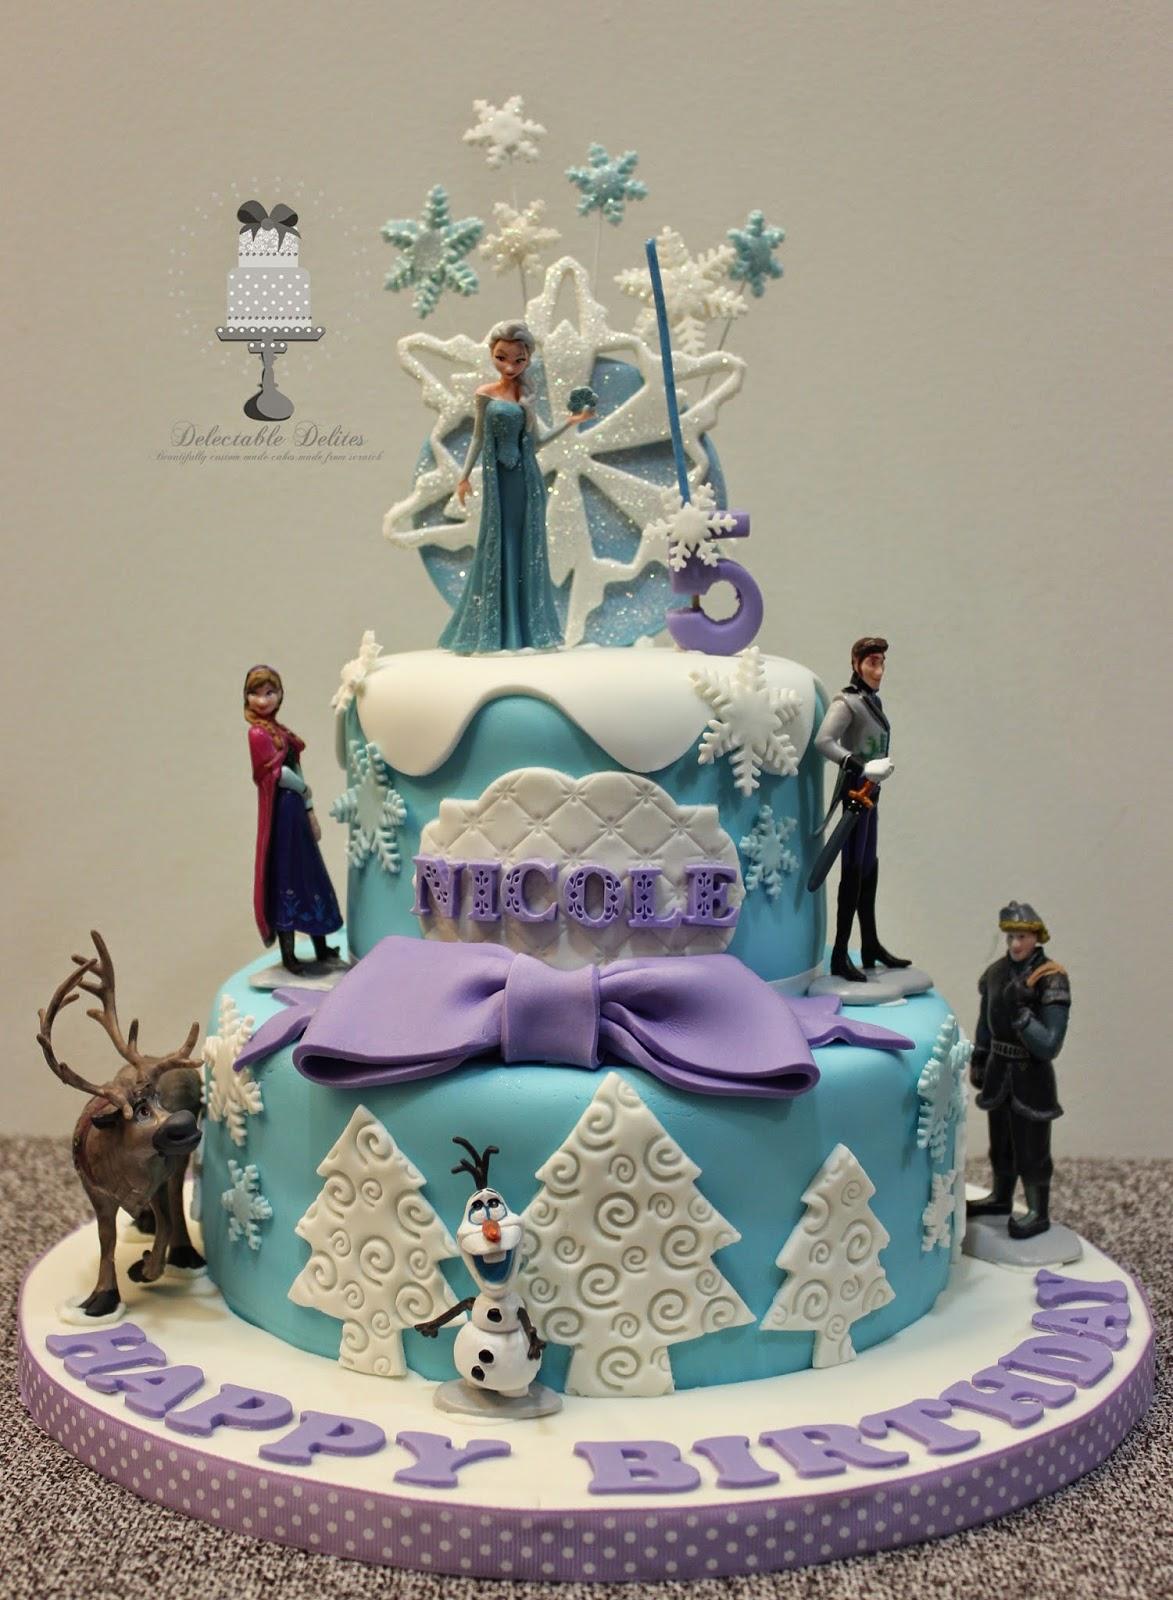 Delectable Delites Frozen theme cake for Nicoles 5th birthday